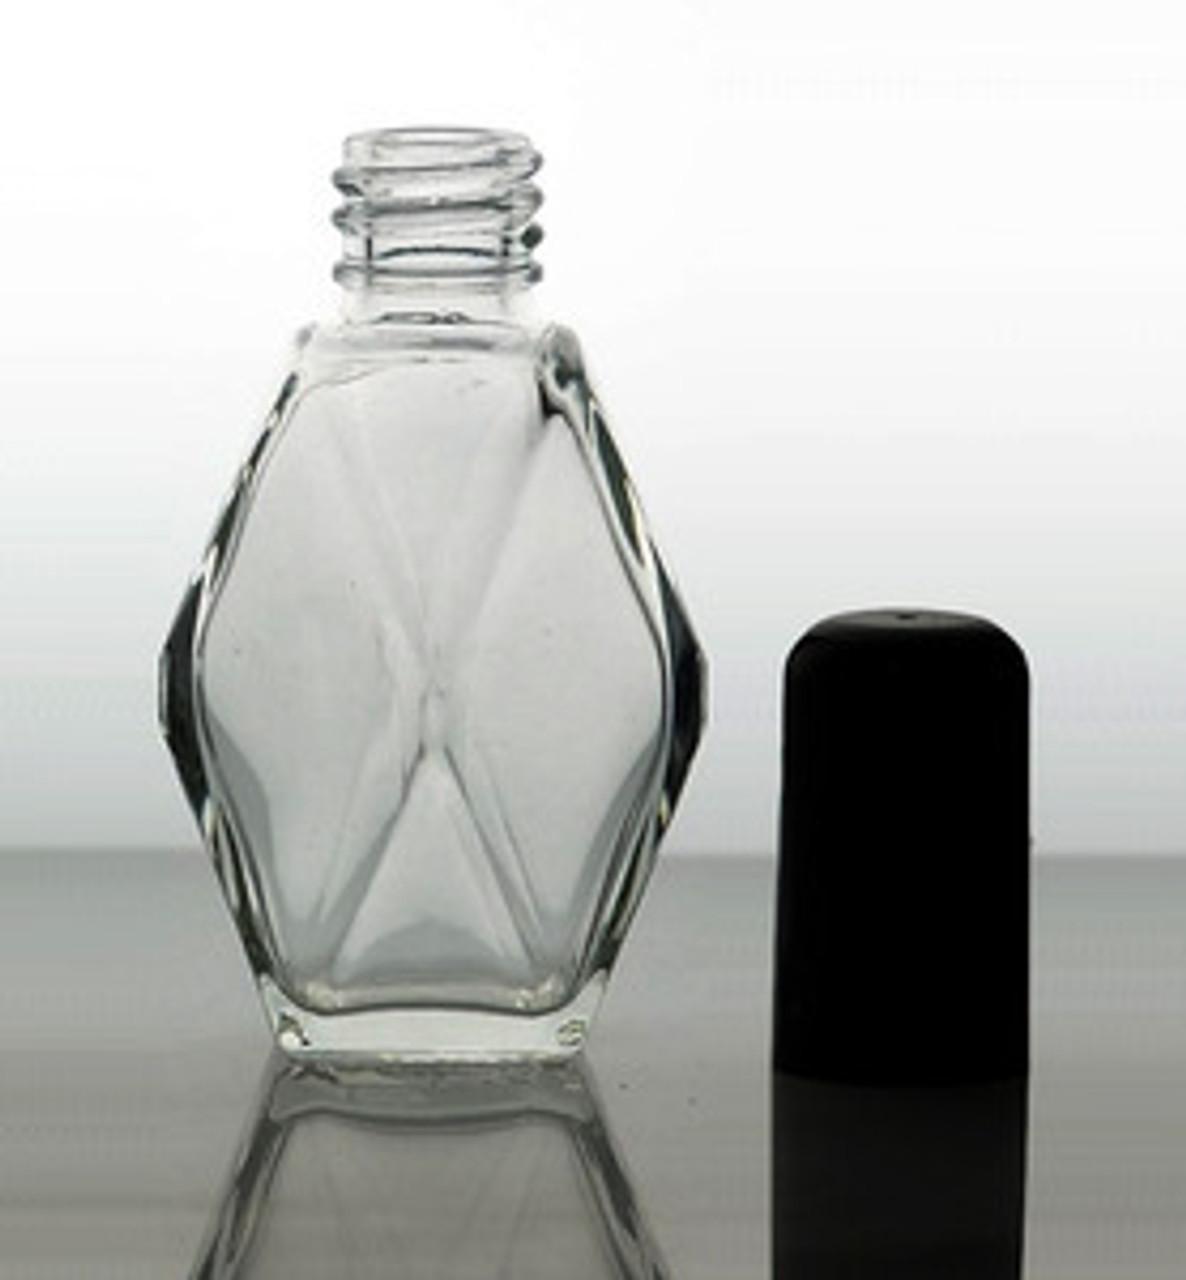 30 ml 1 oz Diamond Cut Bottles